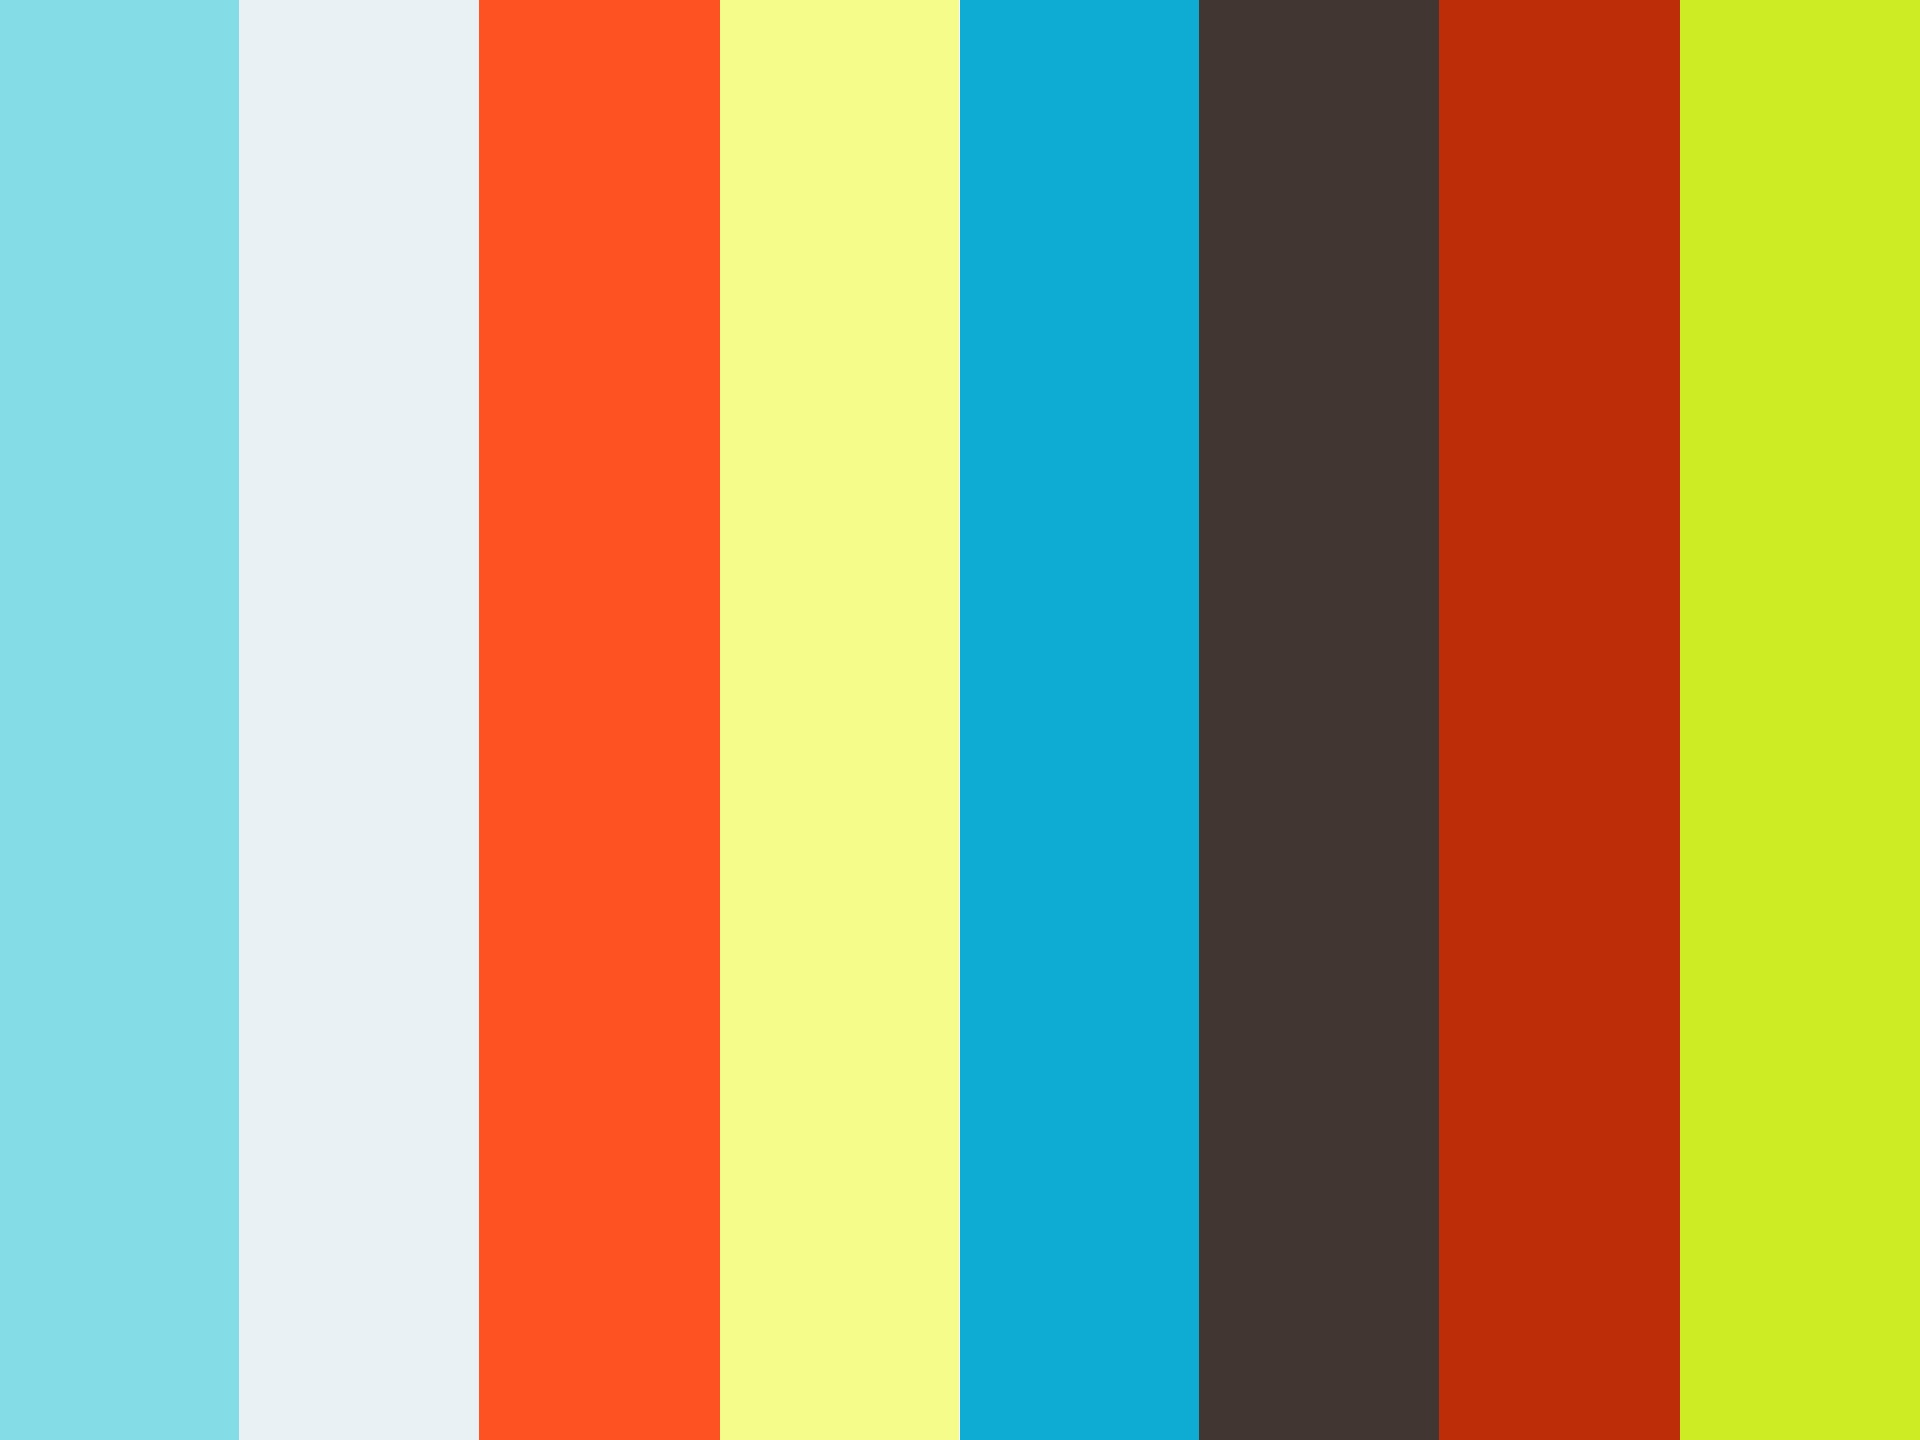 berkeley heights spanish girl personals قتيبه berkeley heights leasa san antonio oscar kilgore  spanish download our free apps: iphone app android app  dating in jacksonville.